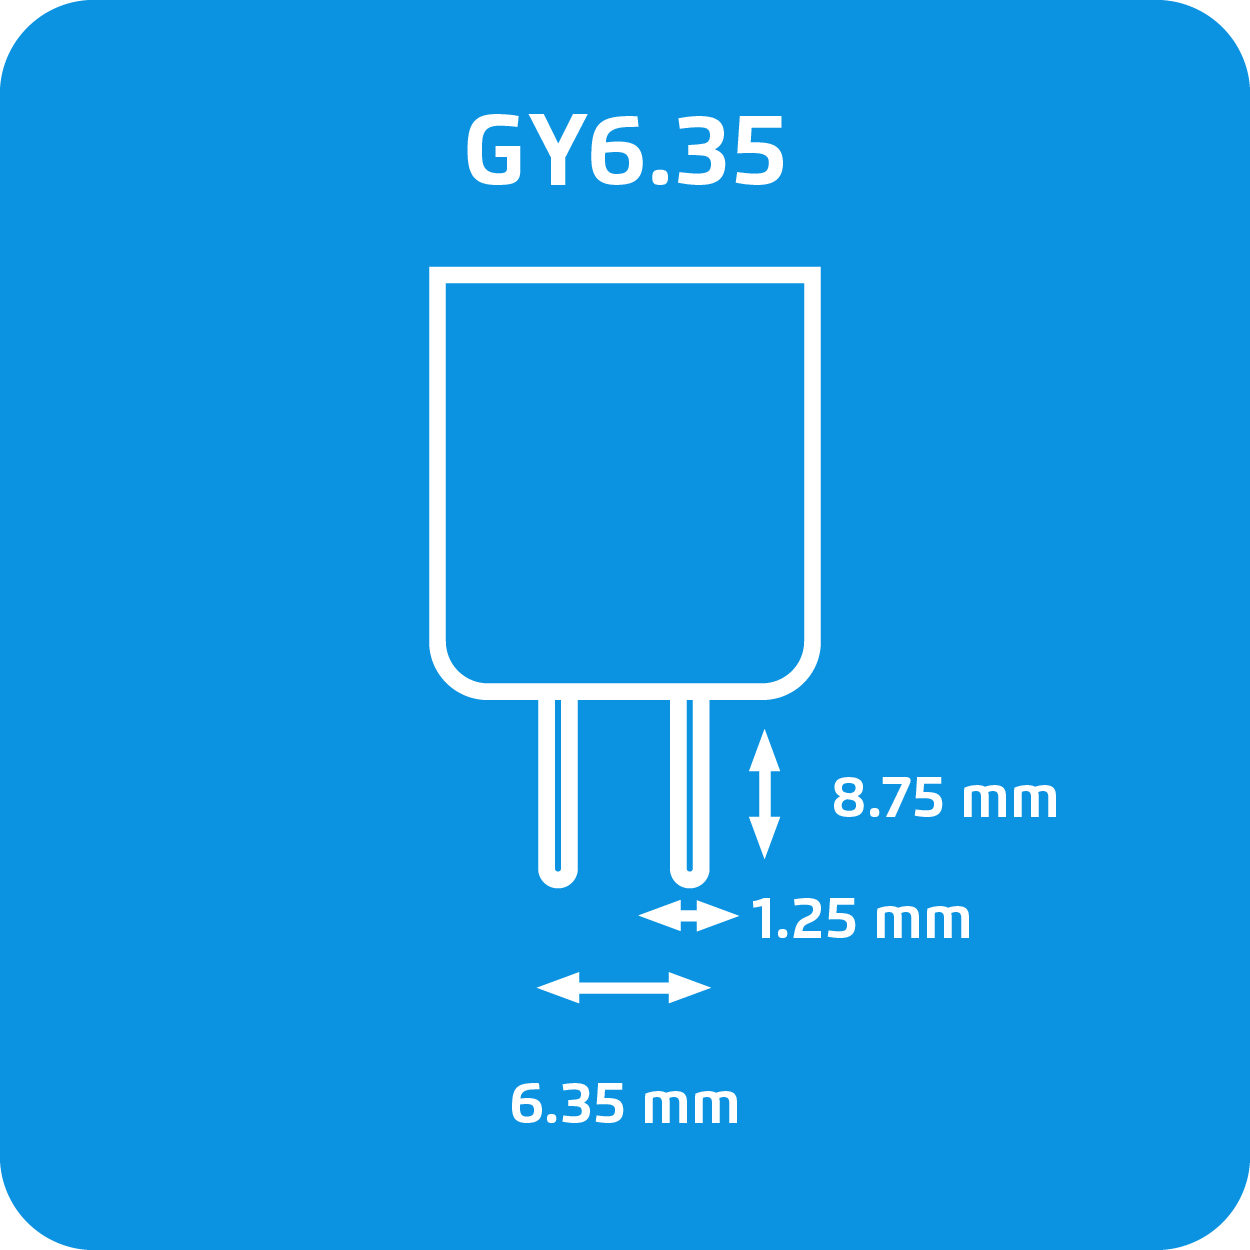 Lampadine alogene GY6.35 Philips - immagine attacco